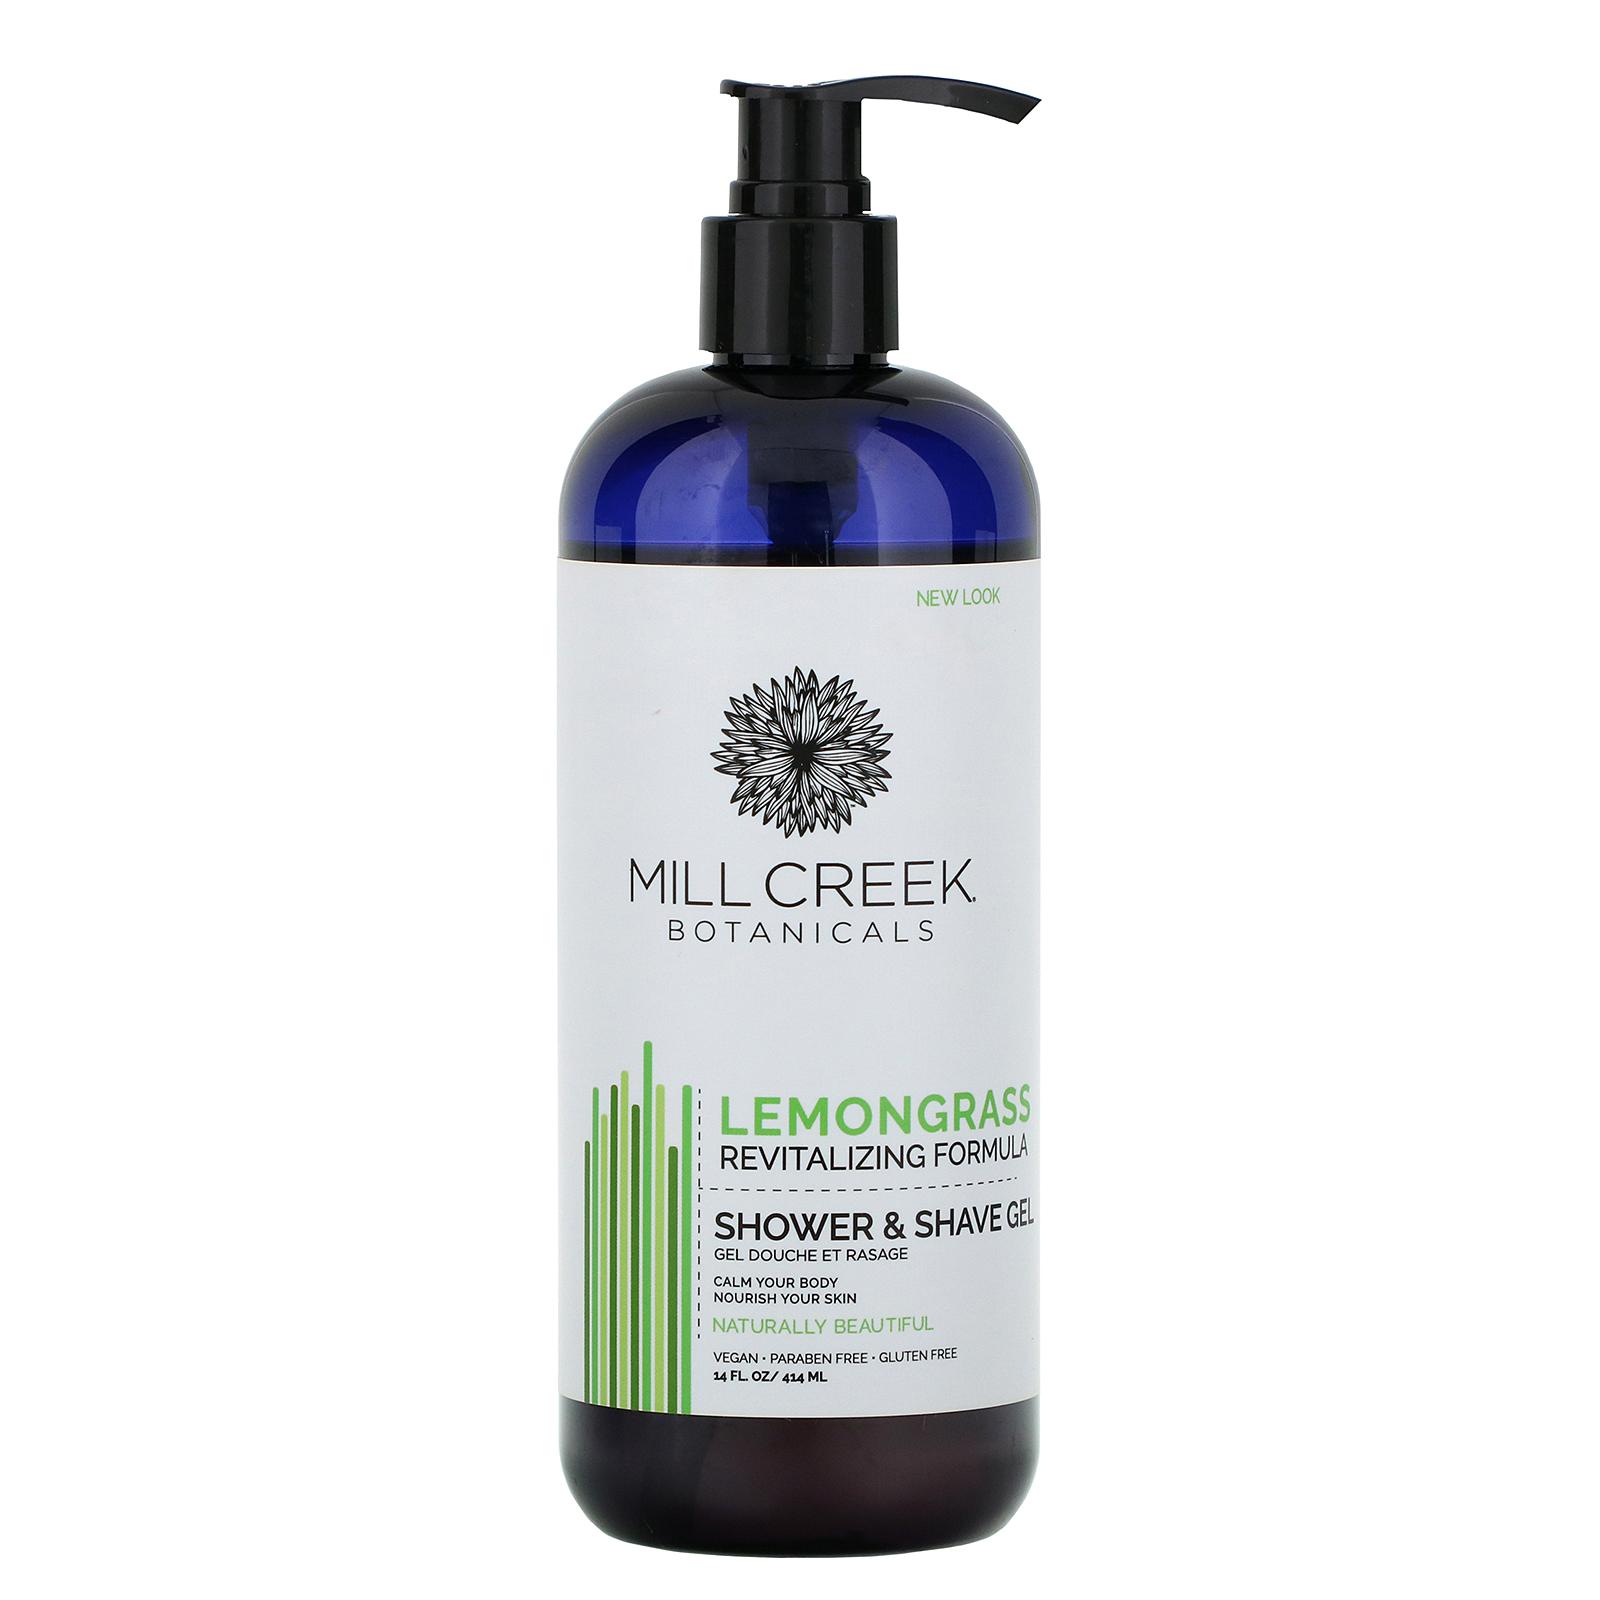 Mill Creek Botanicals, Shower & Shave Gel, Lemongrass, 14 fl oz (414 ml)